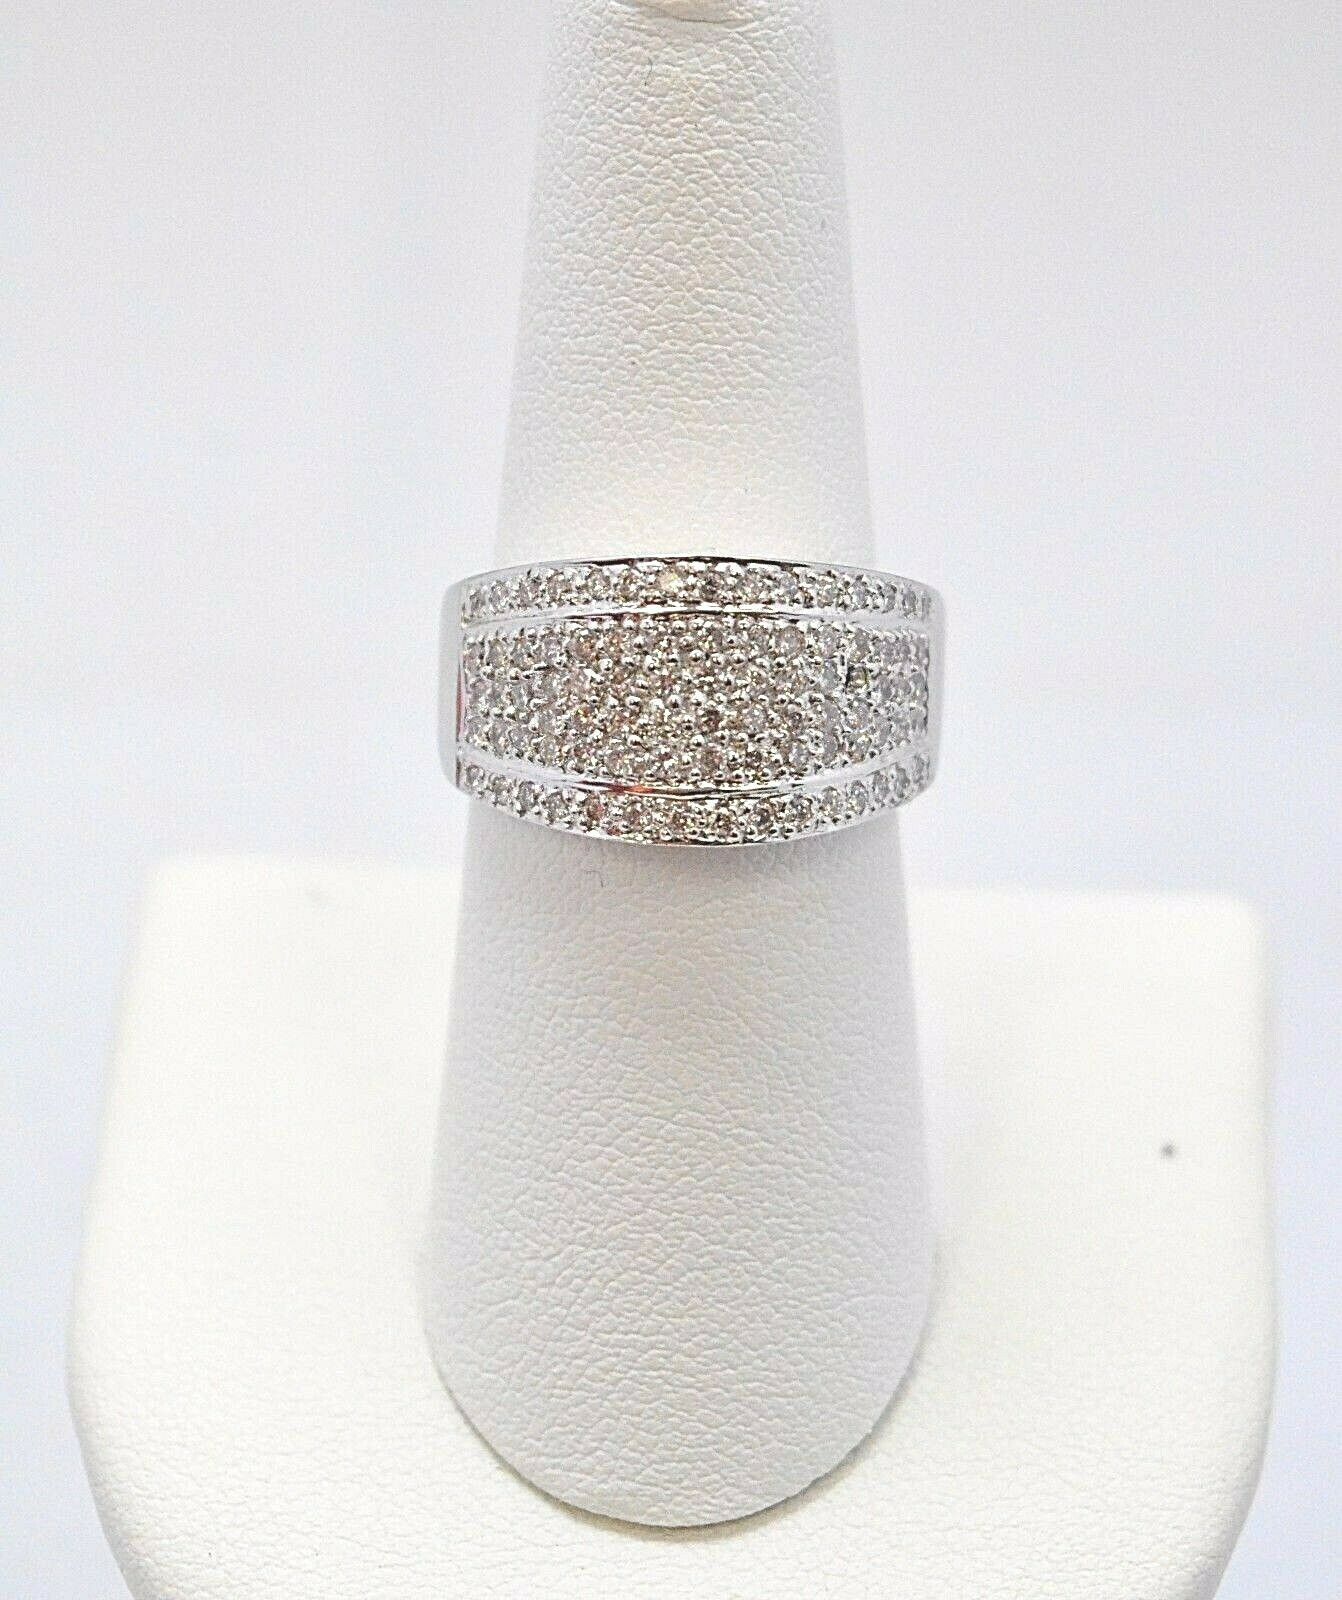 1596- 14K WHITE gold RING RING W  64 DIAMONDS 0.72TCW 7.2GRAMS SIZE 7.25